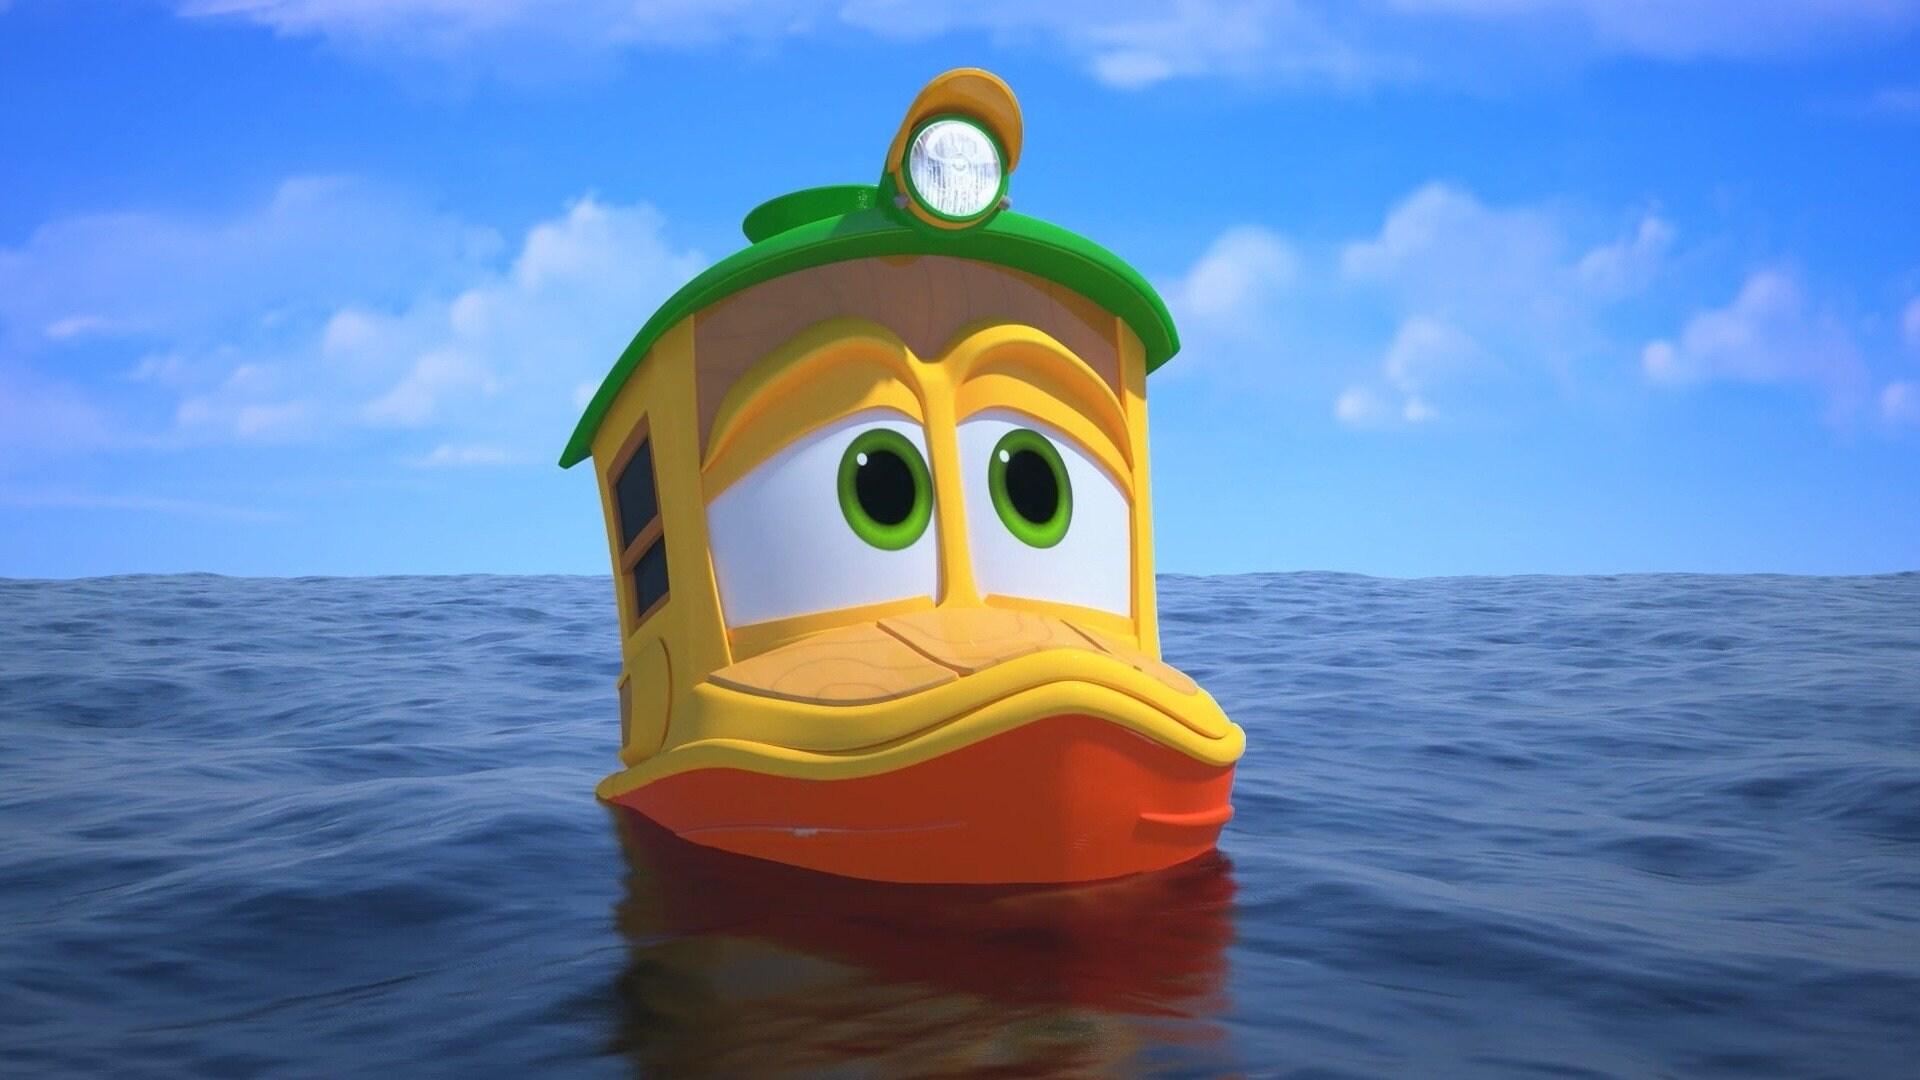 Go, Kay, Rescue Duck!